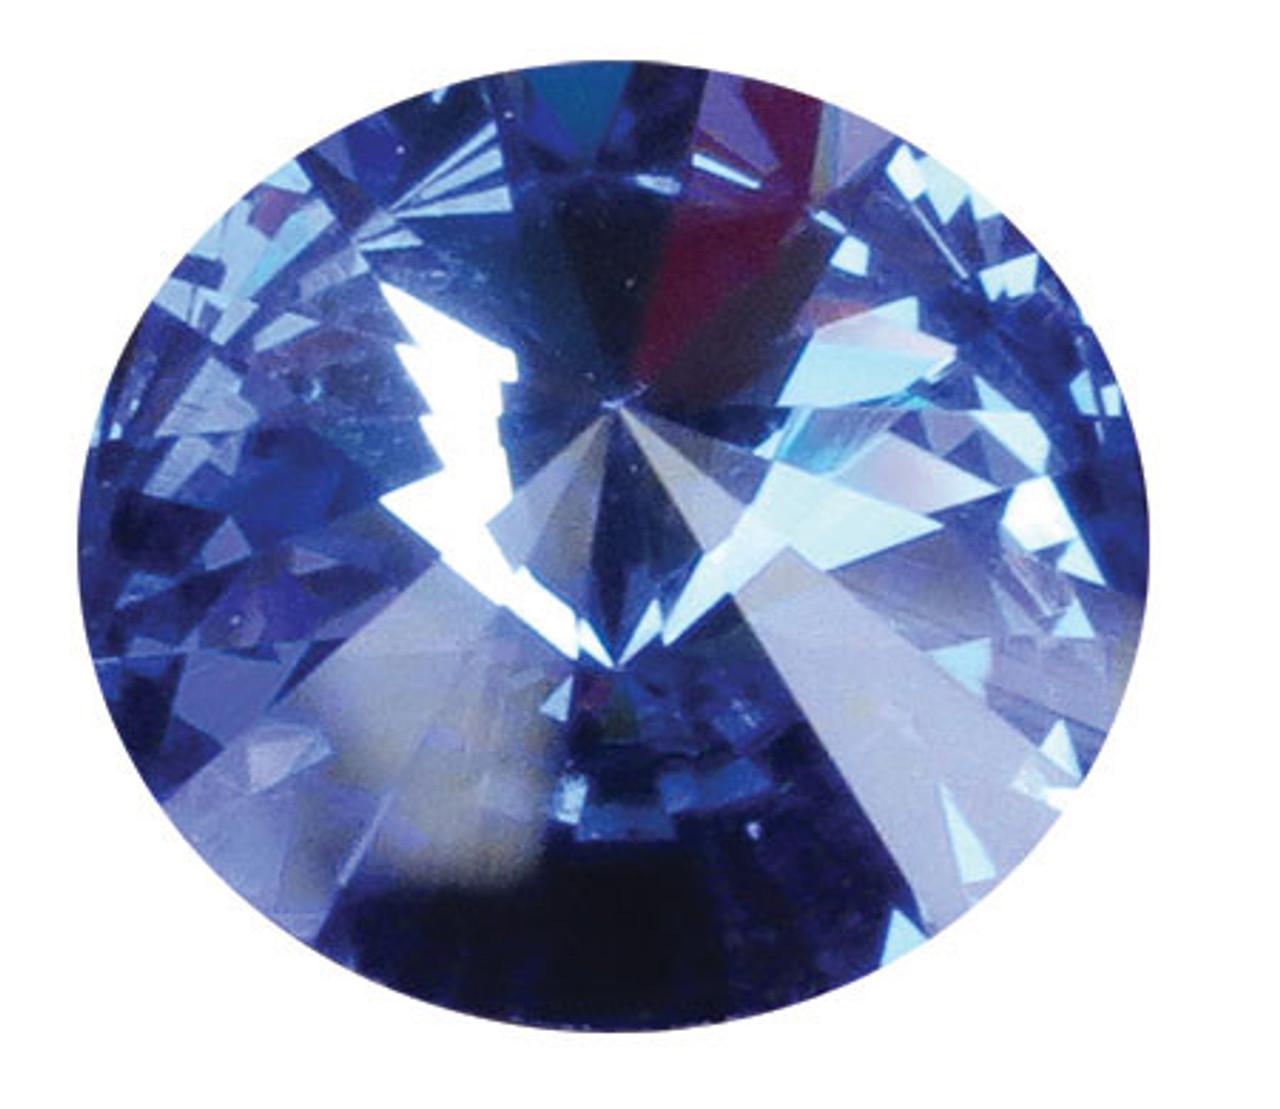 SCSEP - Swarovski Crystal Gemstones Sapphire (September) 6 stones/pack. For ClayPaws® Prints